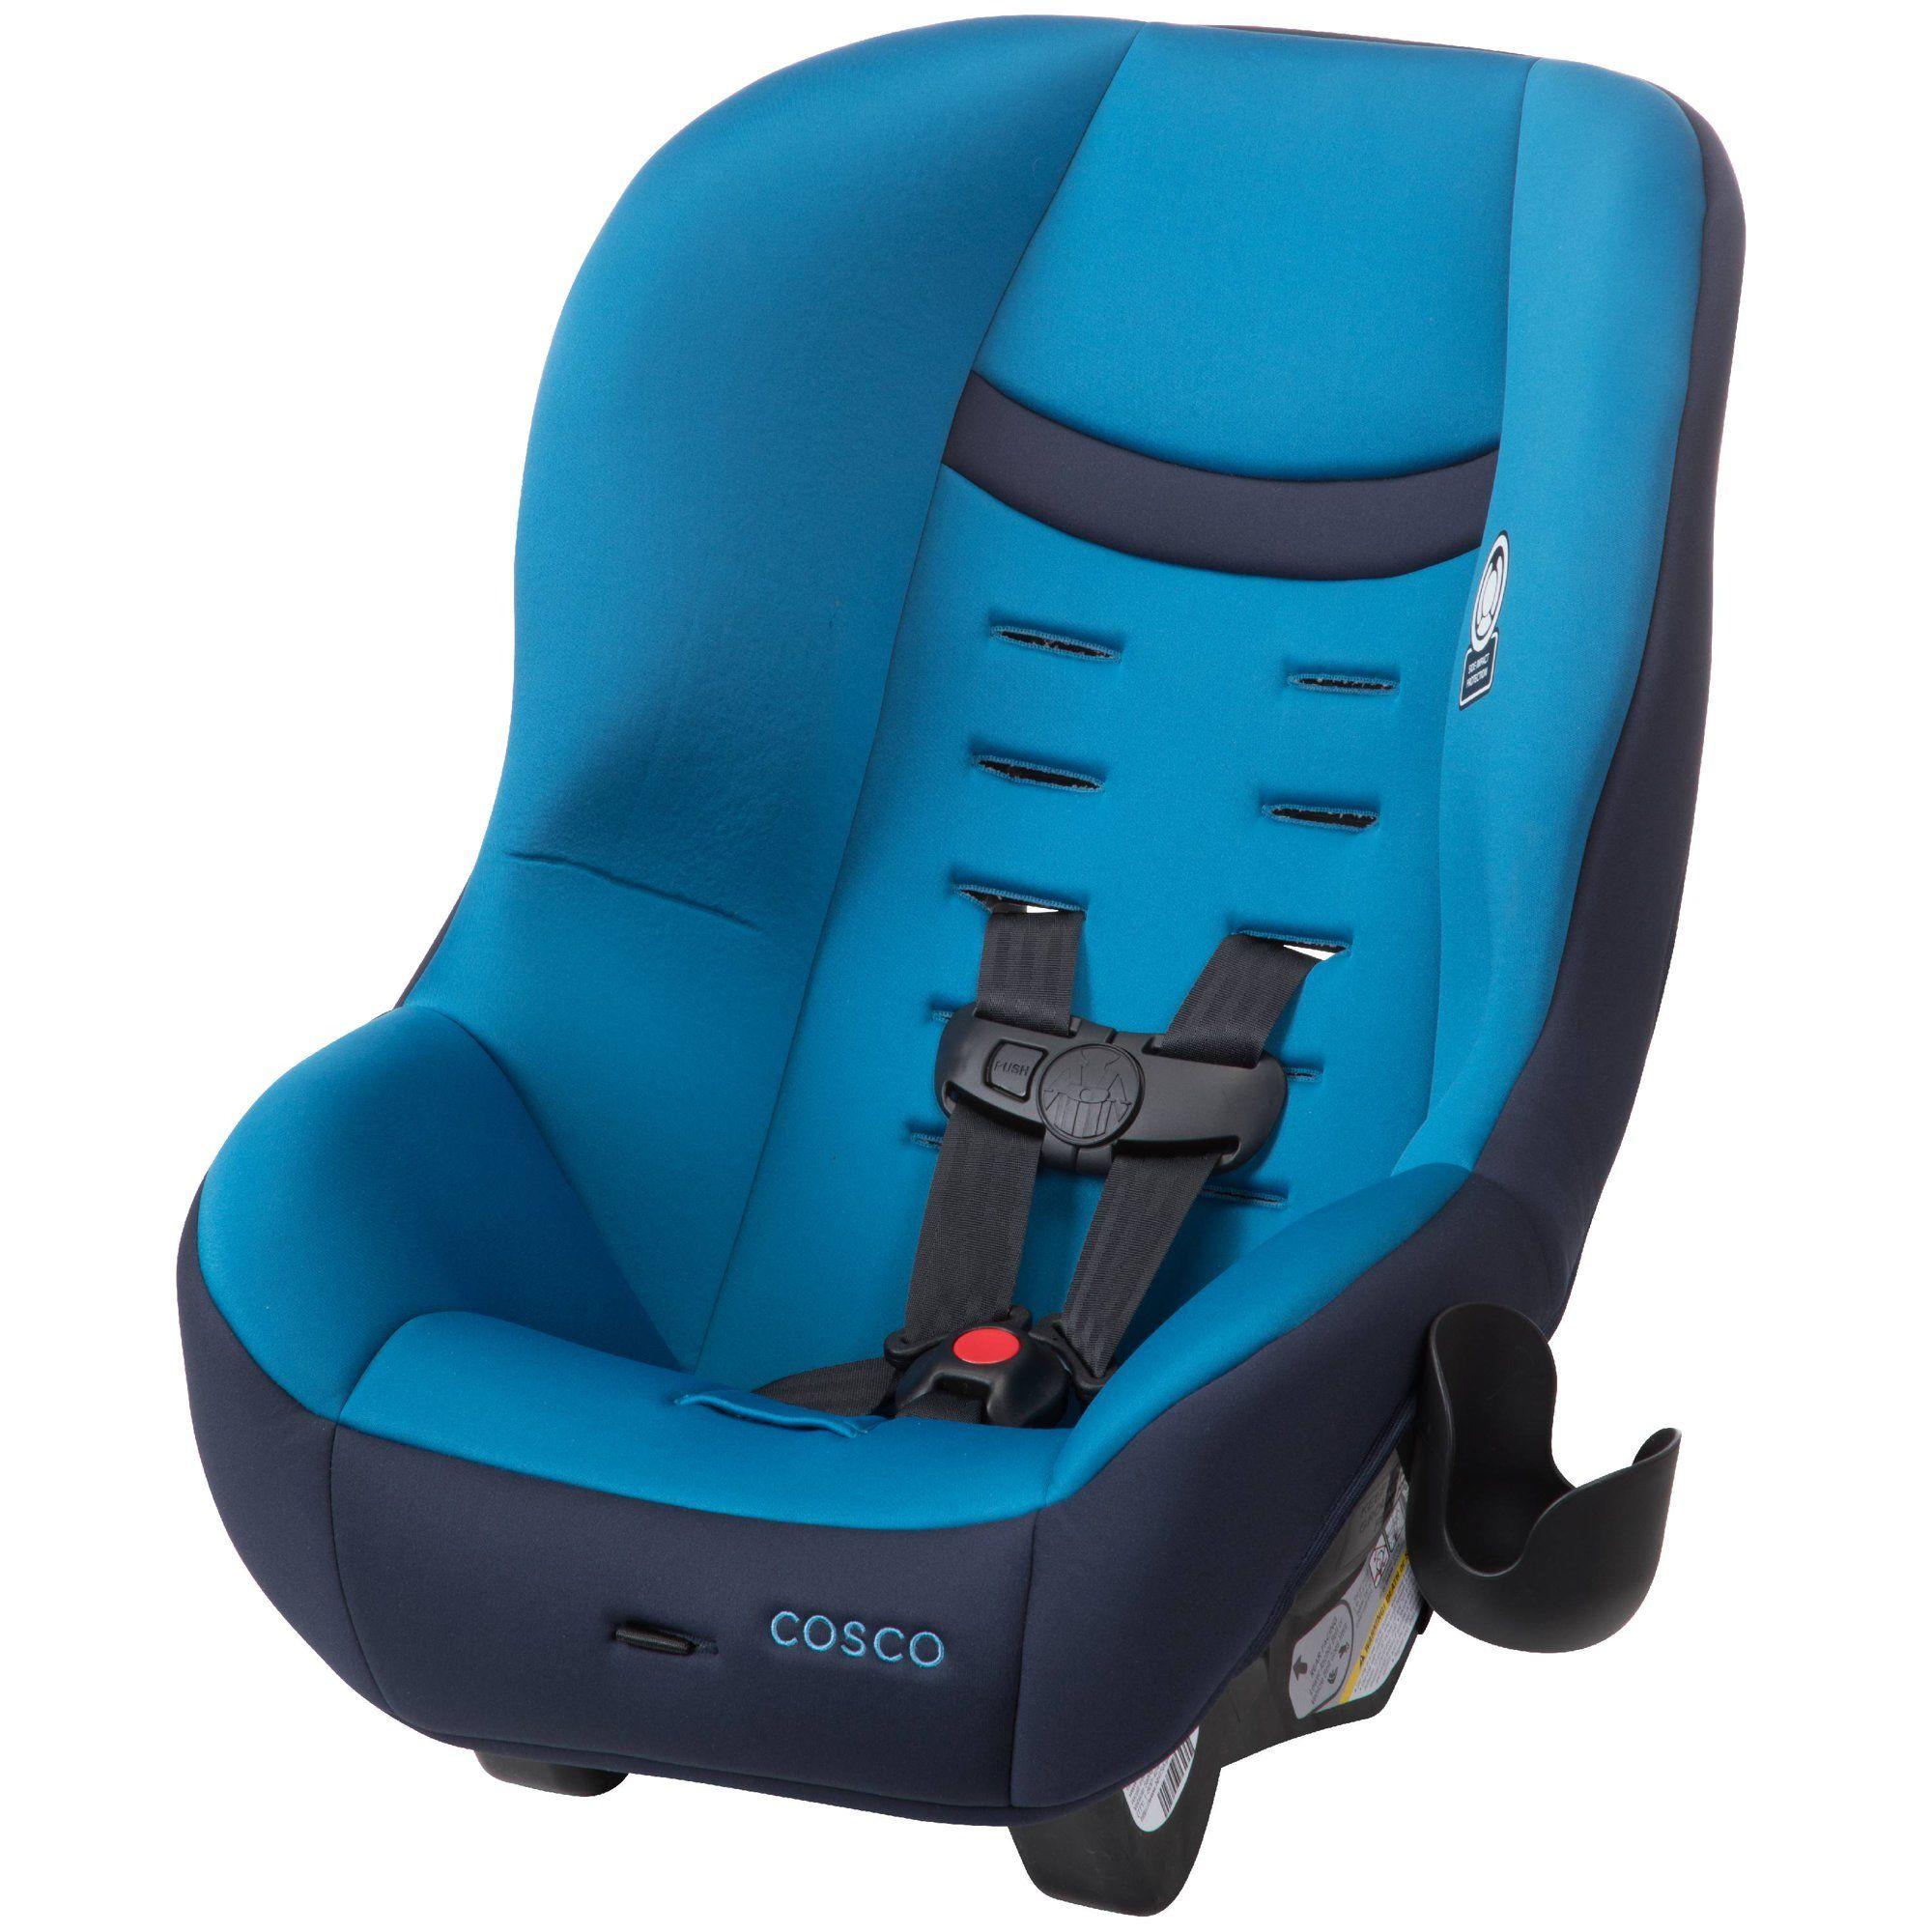 165cm Passenger Car Child Safety Seats General Isofix Interface Belt Strap 100/% Customer Satisfaction Guarantee L